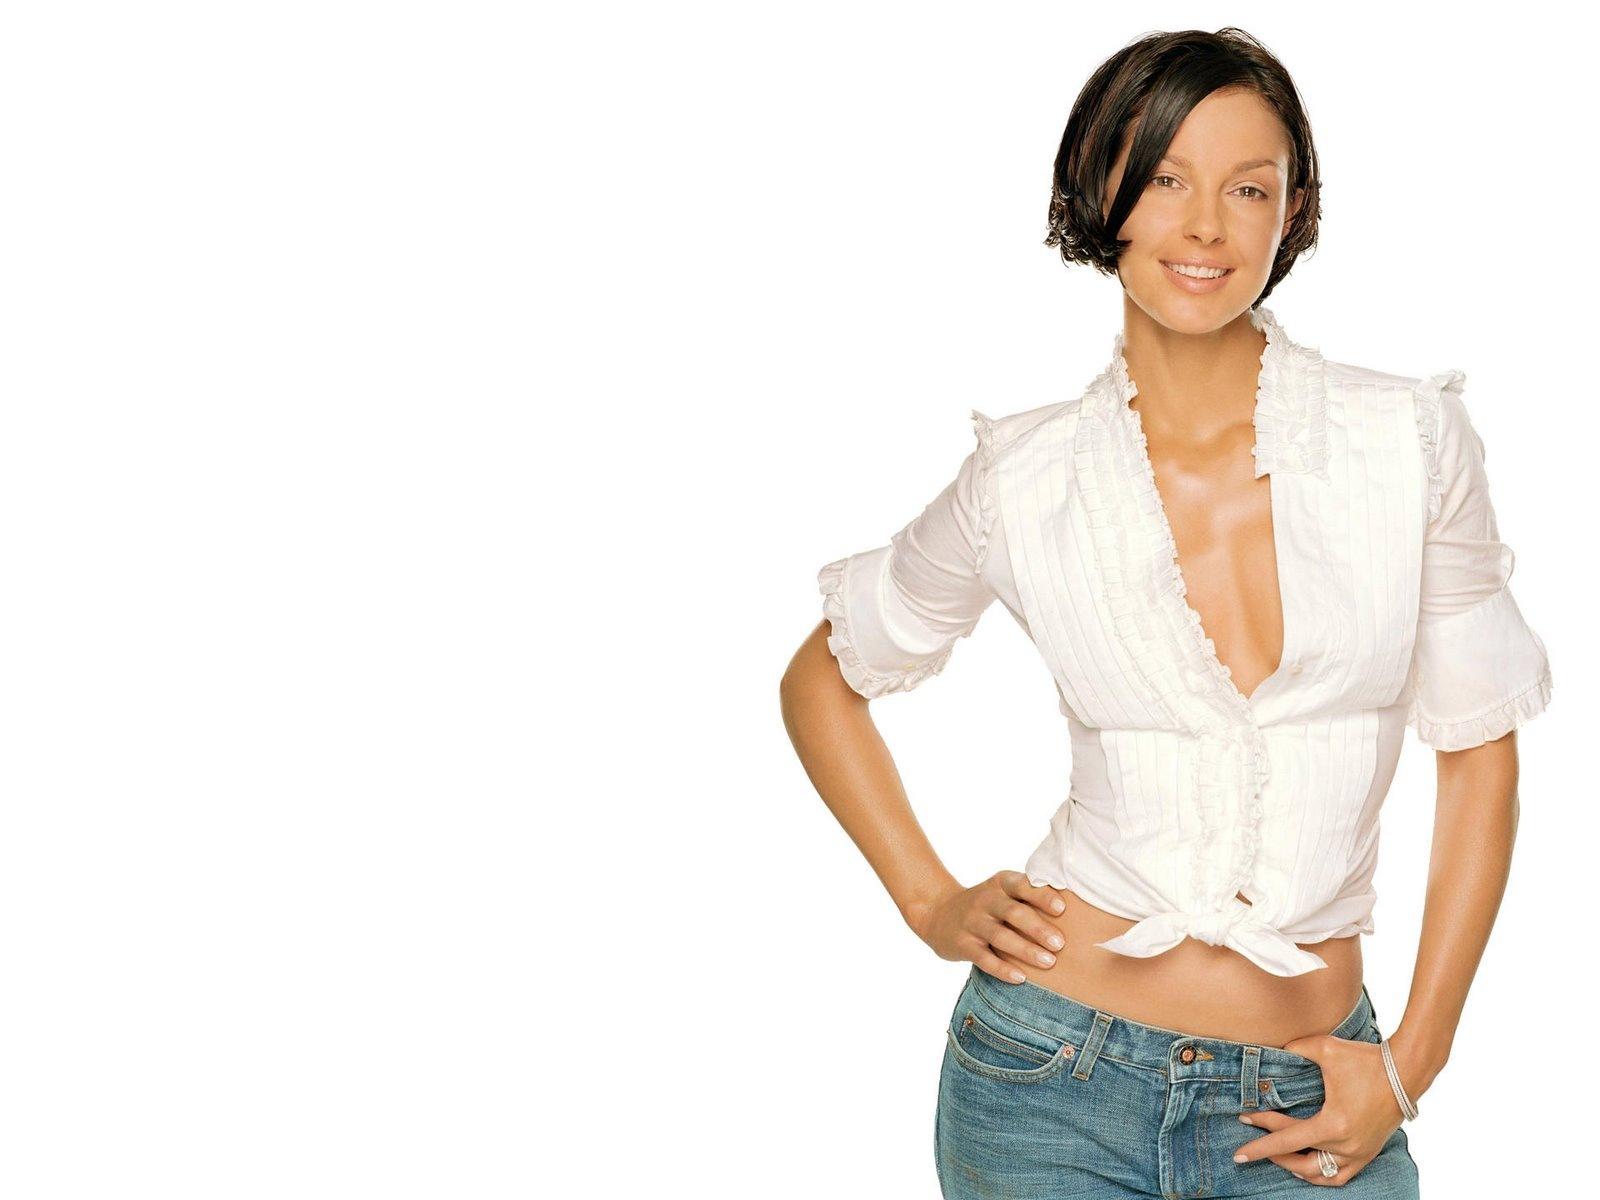 [Ashley Judd 4 1600x1200 hqmodelwallpapers[5].jpg]